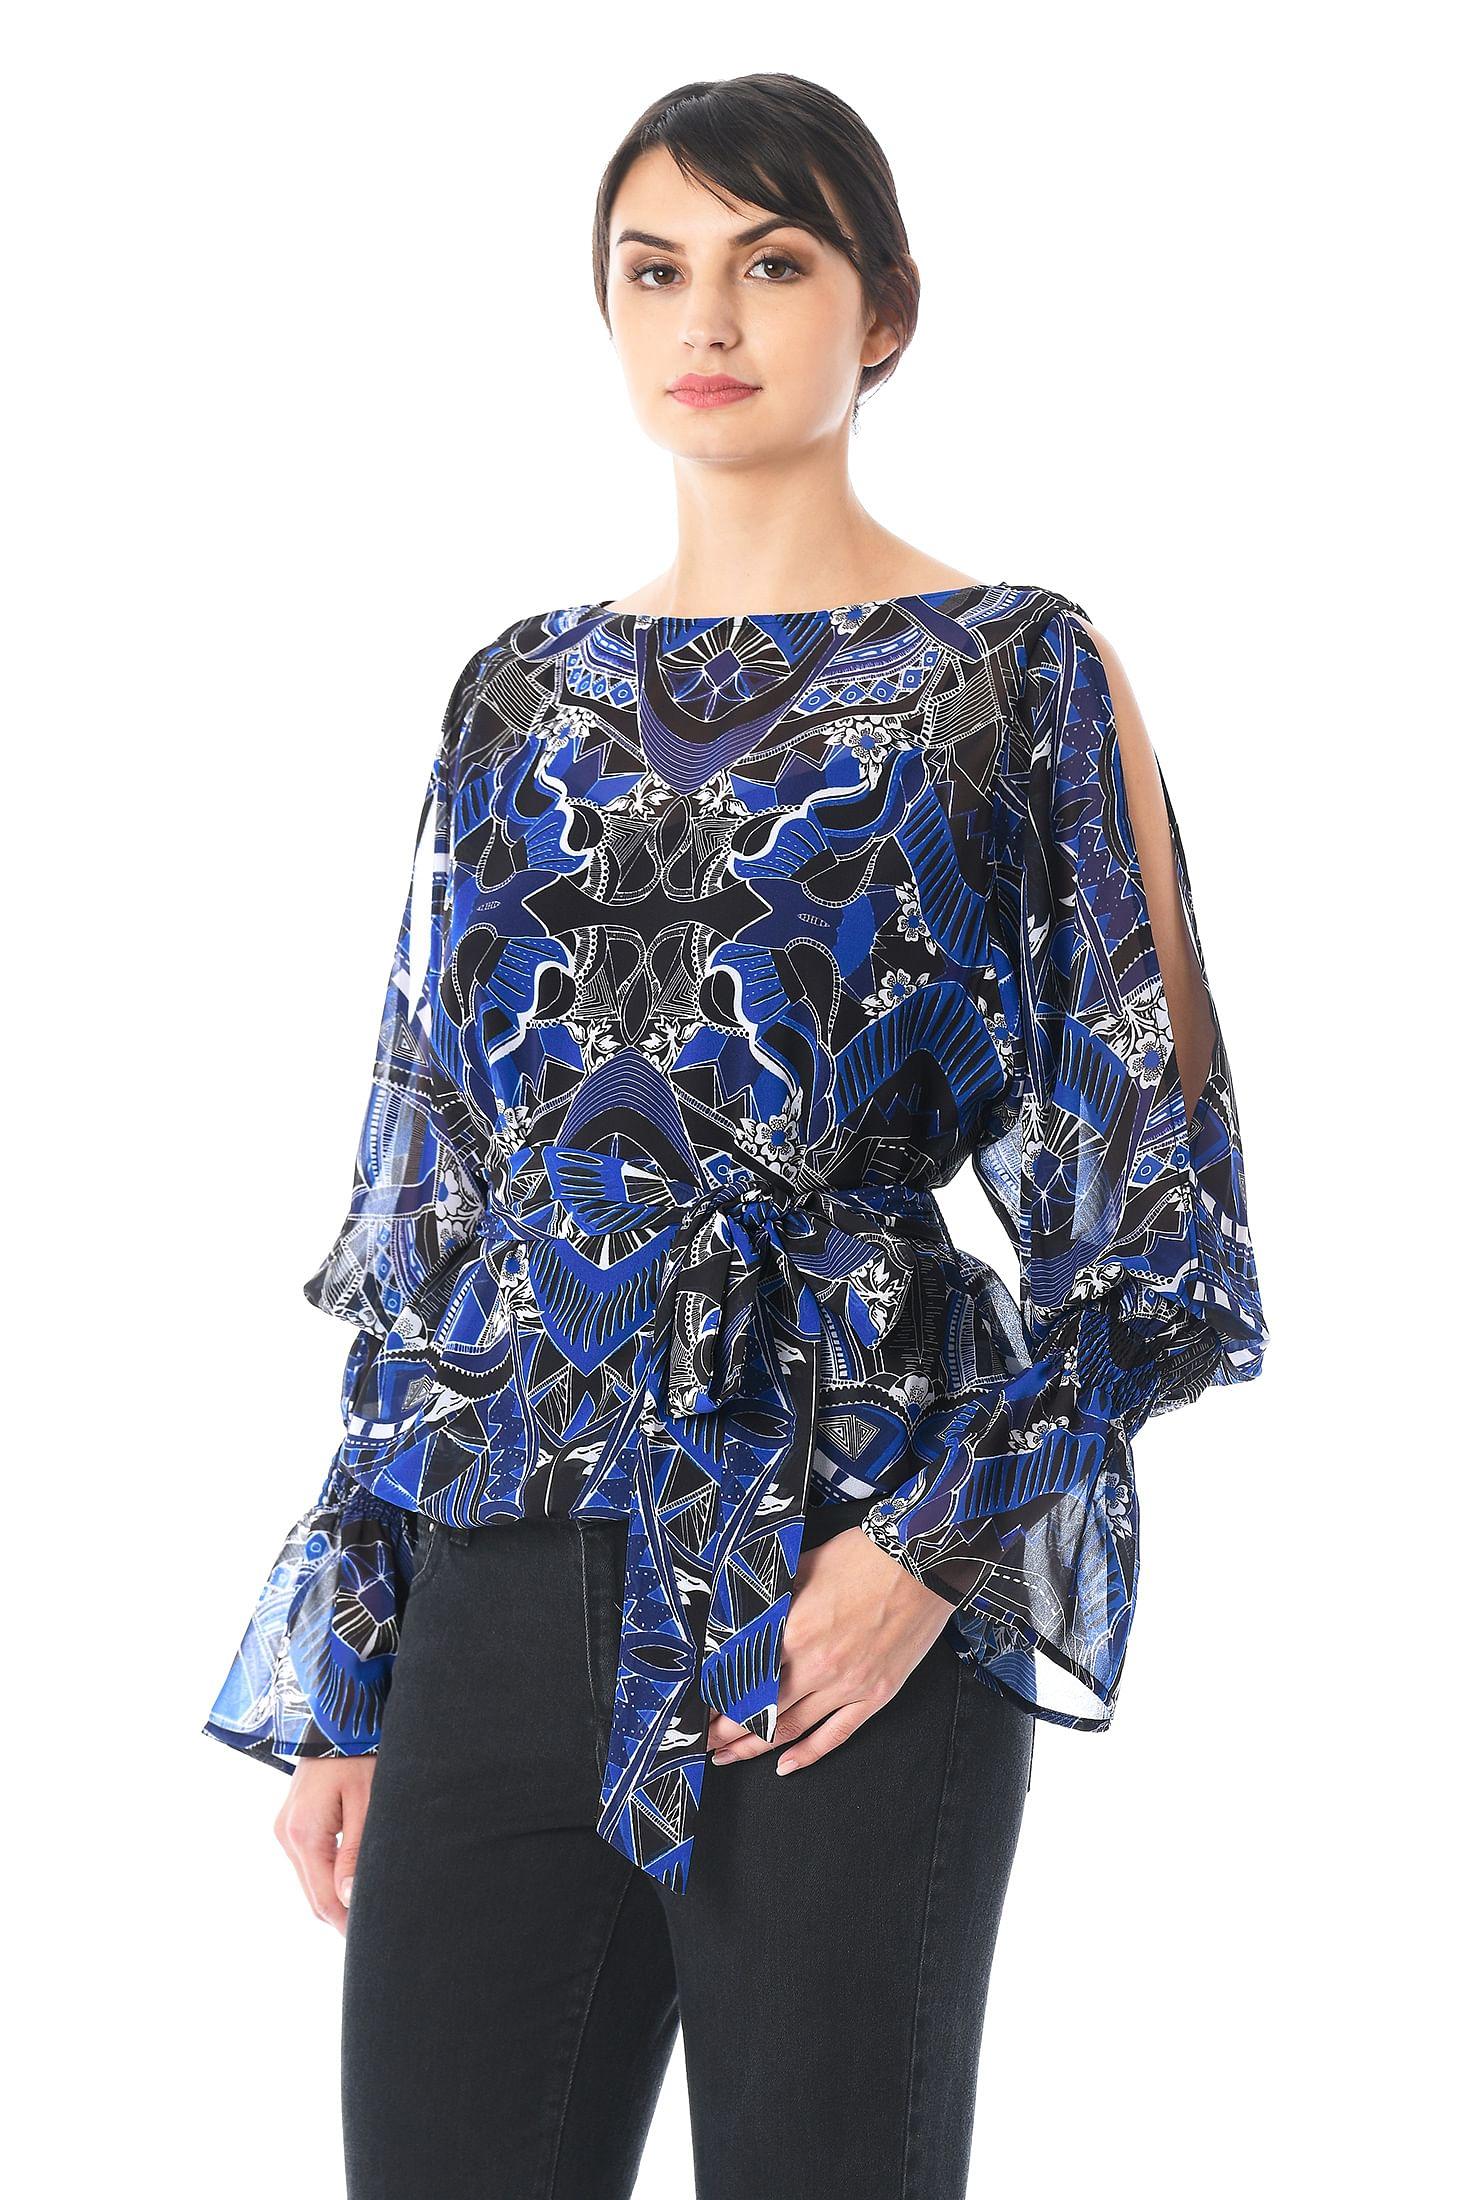 92469eb5 Women's Fashion Clothing 0-36W and Custom